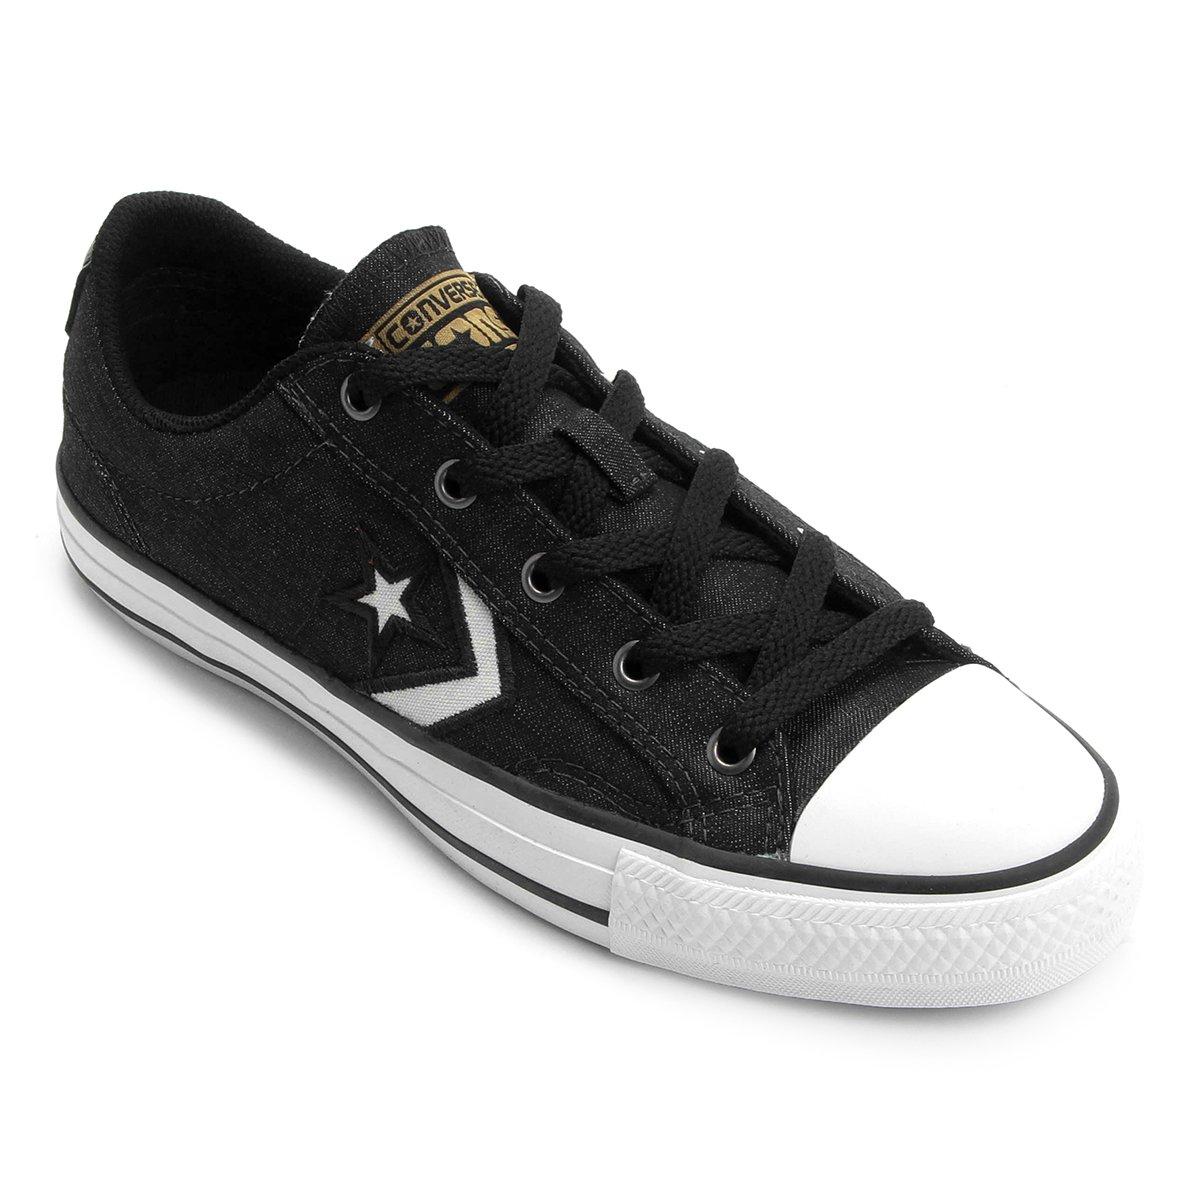 18ce09504f Tênis Converse Star Player Jeans Ev Ox - Compre Agora